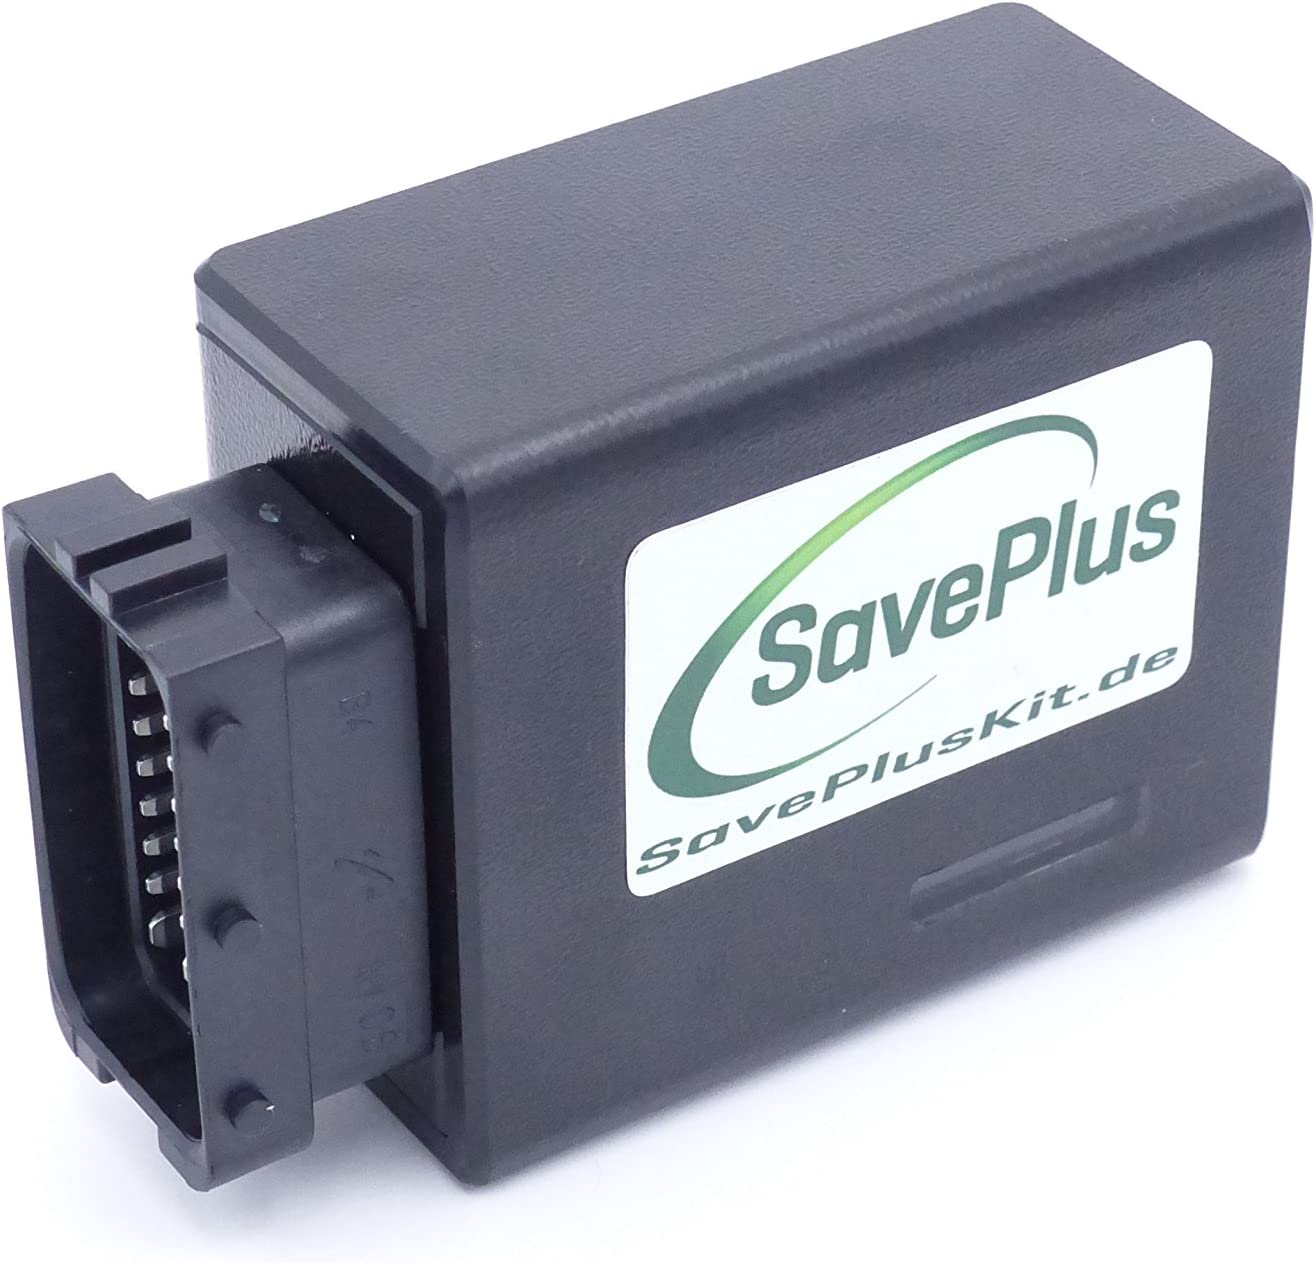 Kraftstoffeinsparung Chiptuning Tuningbox Digital f/ür Passat 2.0 TDI CR 170 PS auf 205 PS Leistungssteigerung